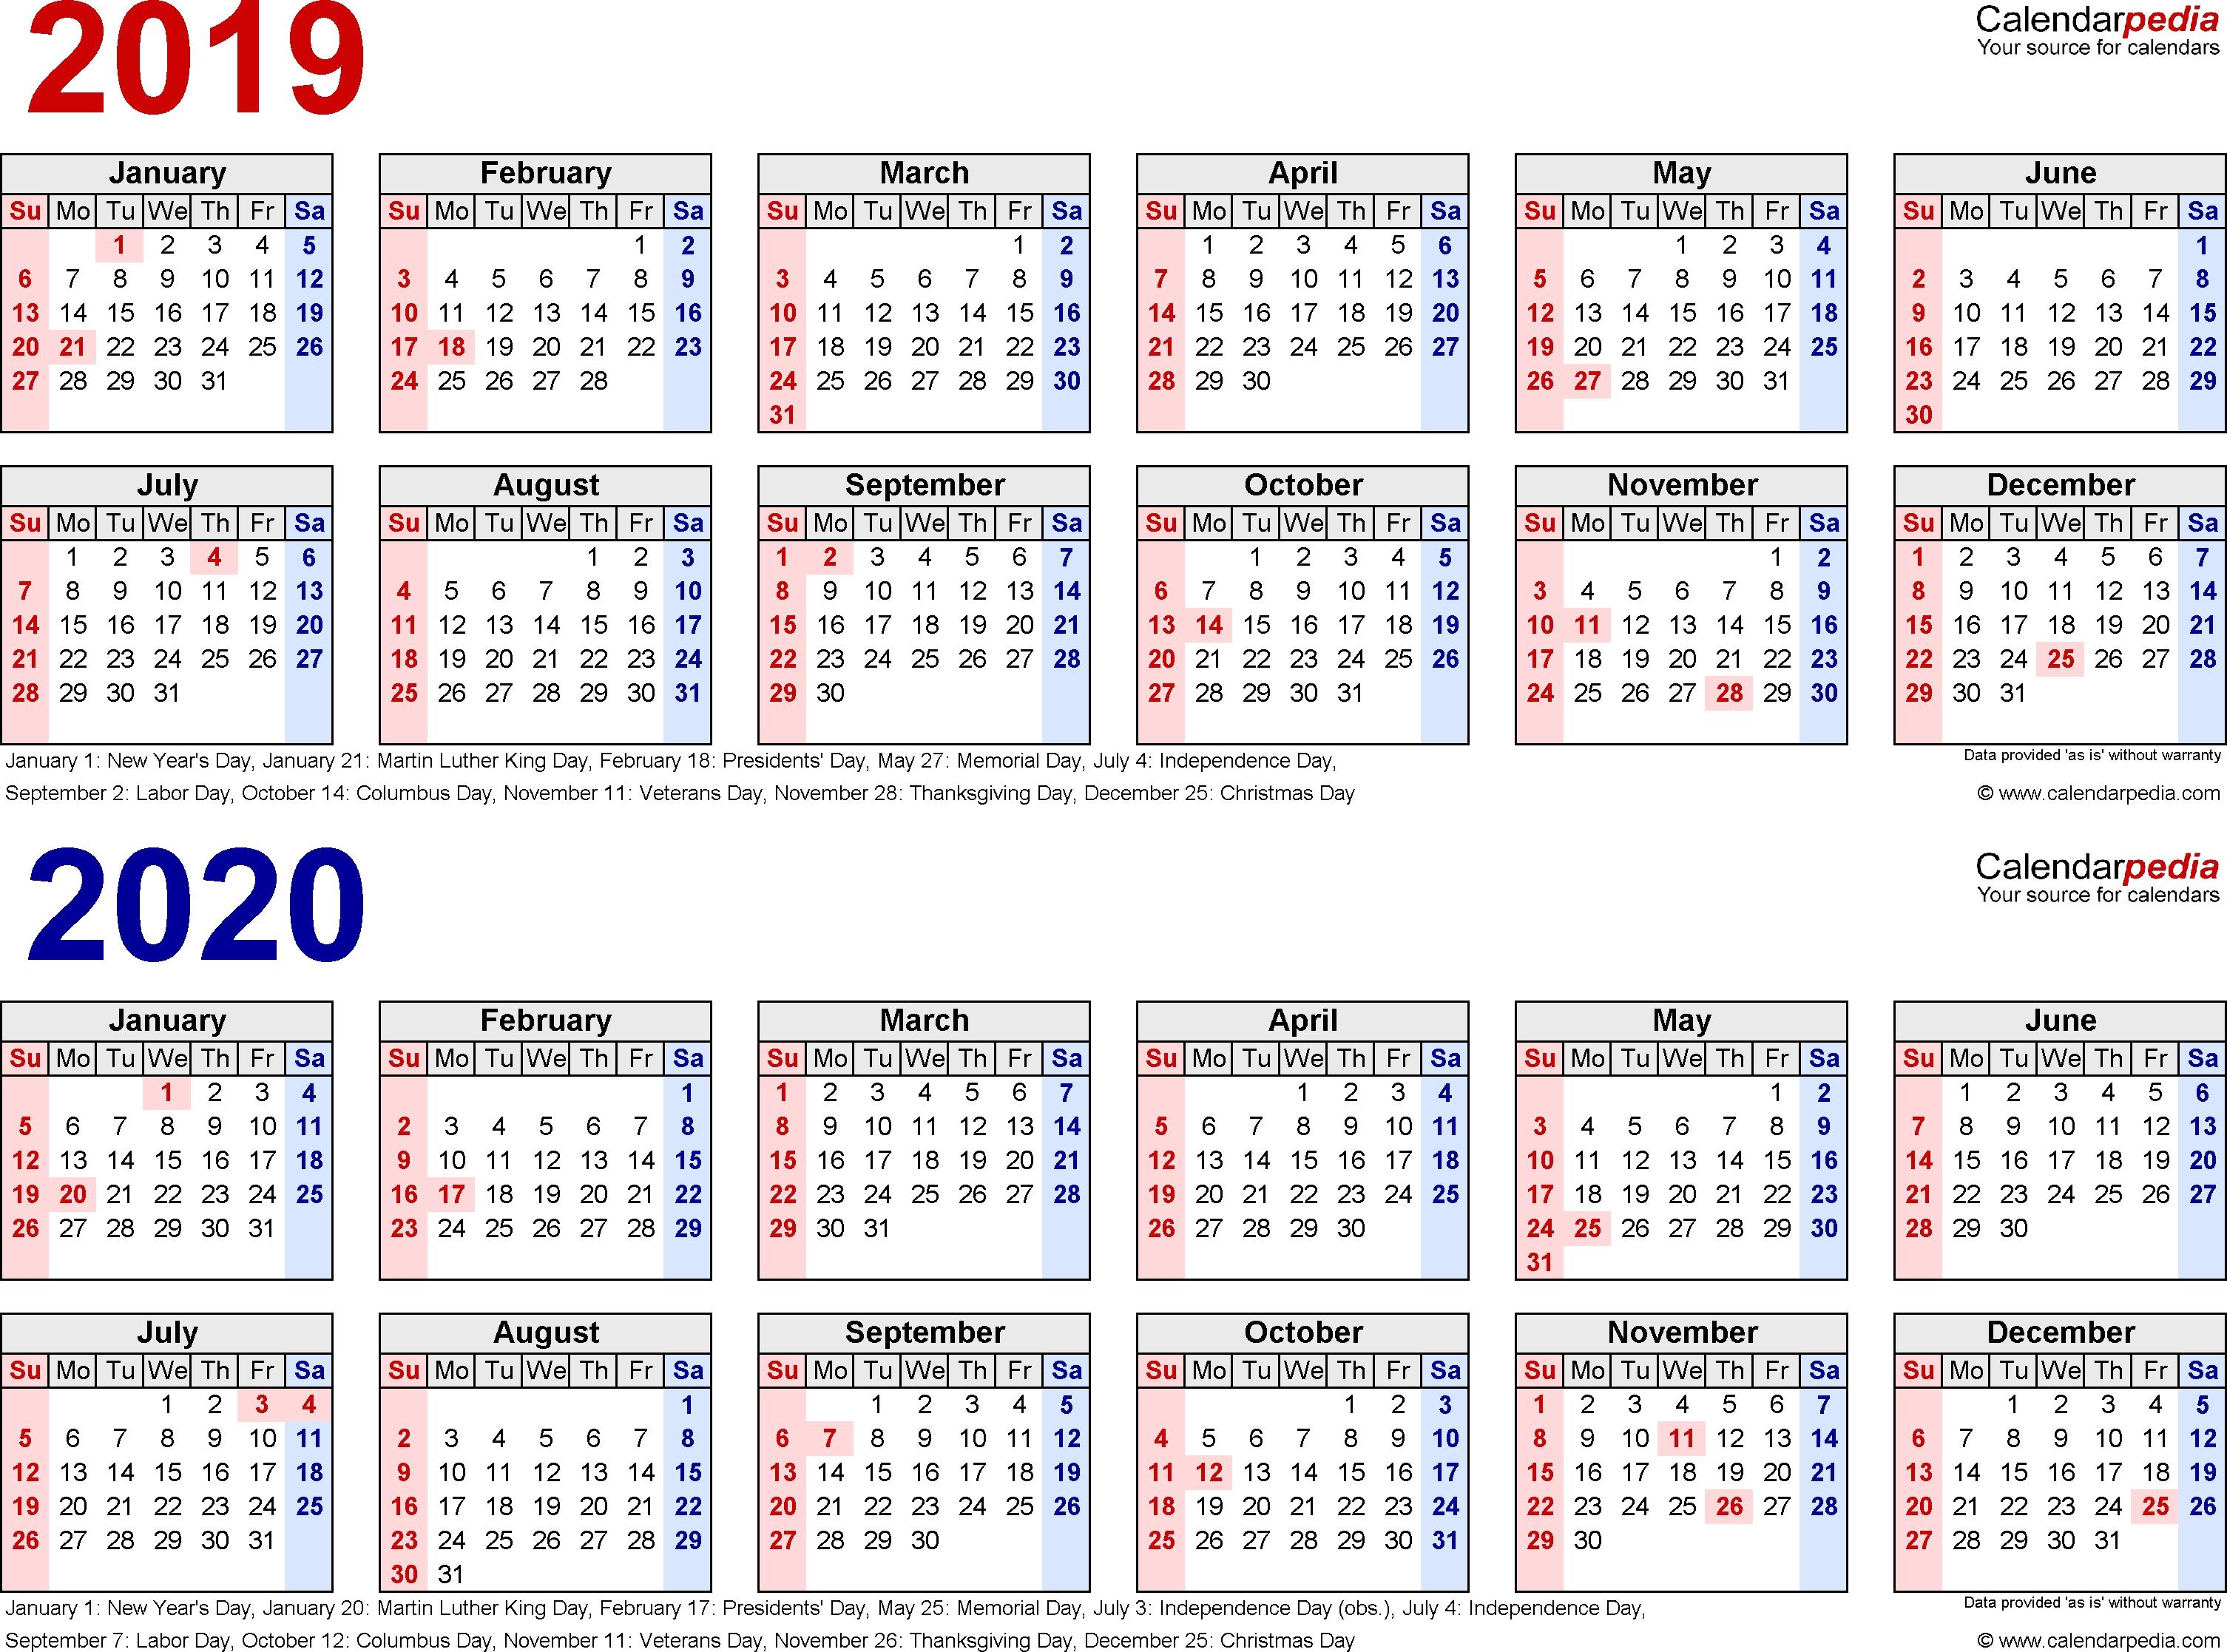 2019-2020 Calendar - Free Printable Two-Year Excel Calendars throughout Week Count Calendar 2019-2020